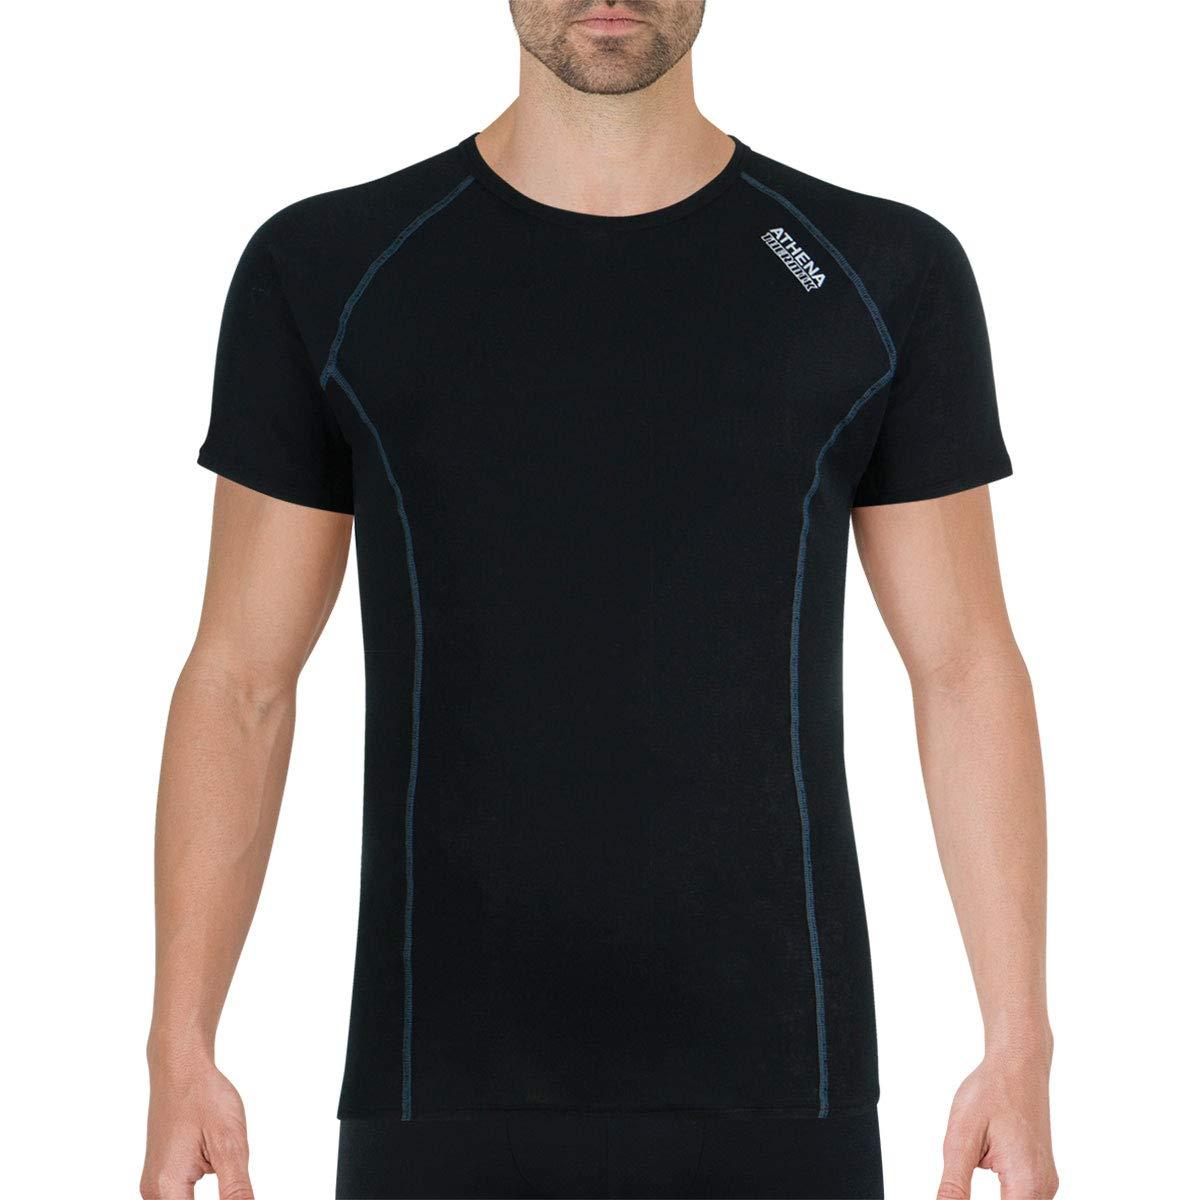 ATHENA Thermik Camiseta térmica para Hombre